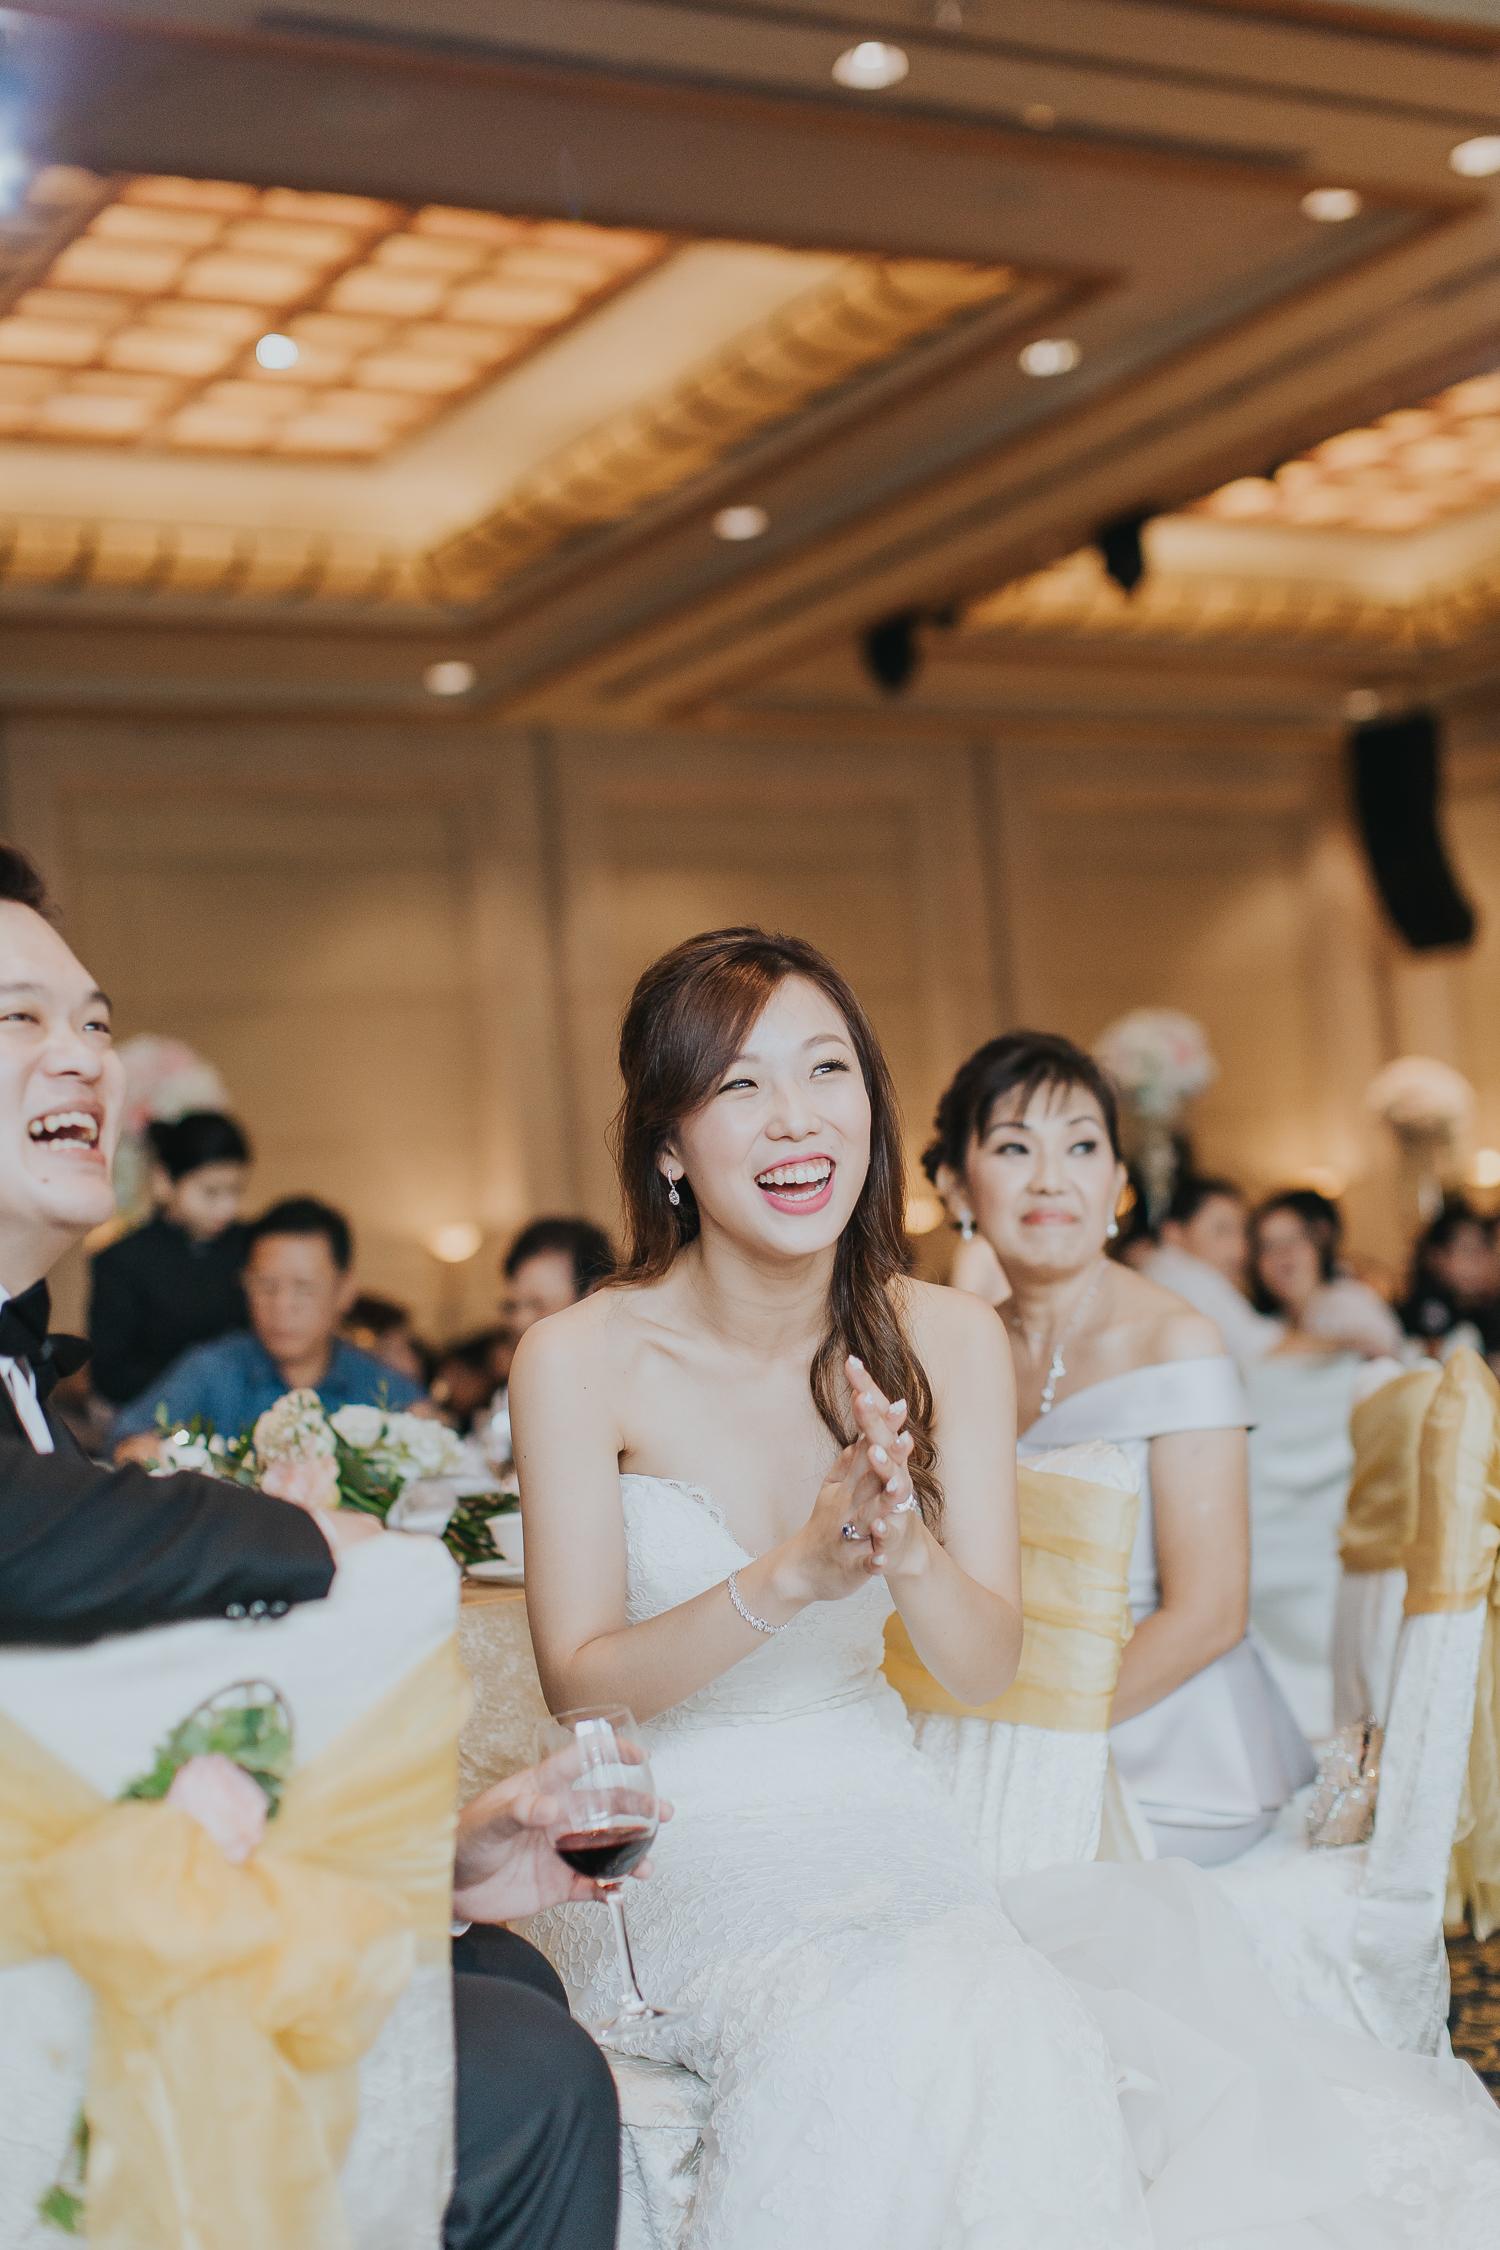 Singapore+Actual+Day+Wedding+Photographer+Grand+Mercure+Oliver+Estelle-0087.jpg